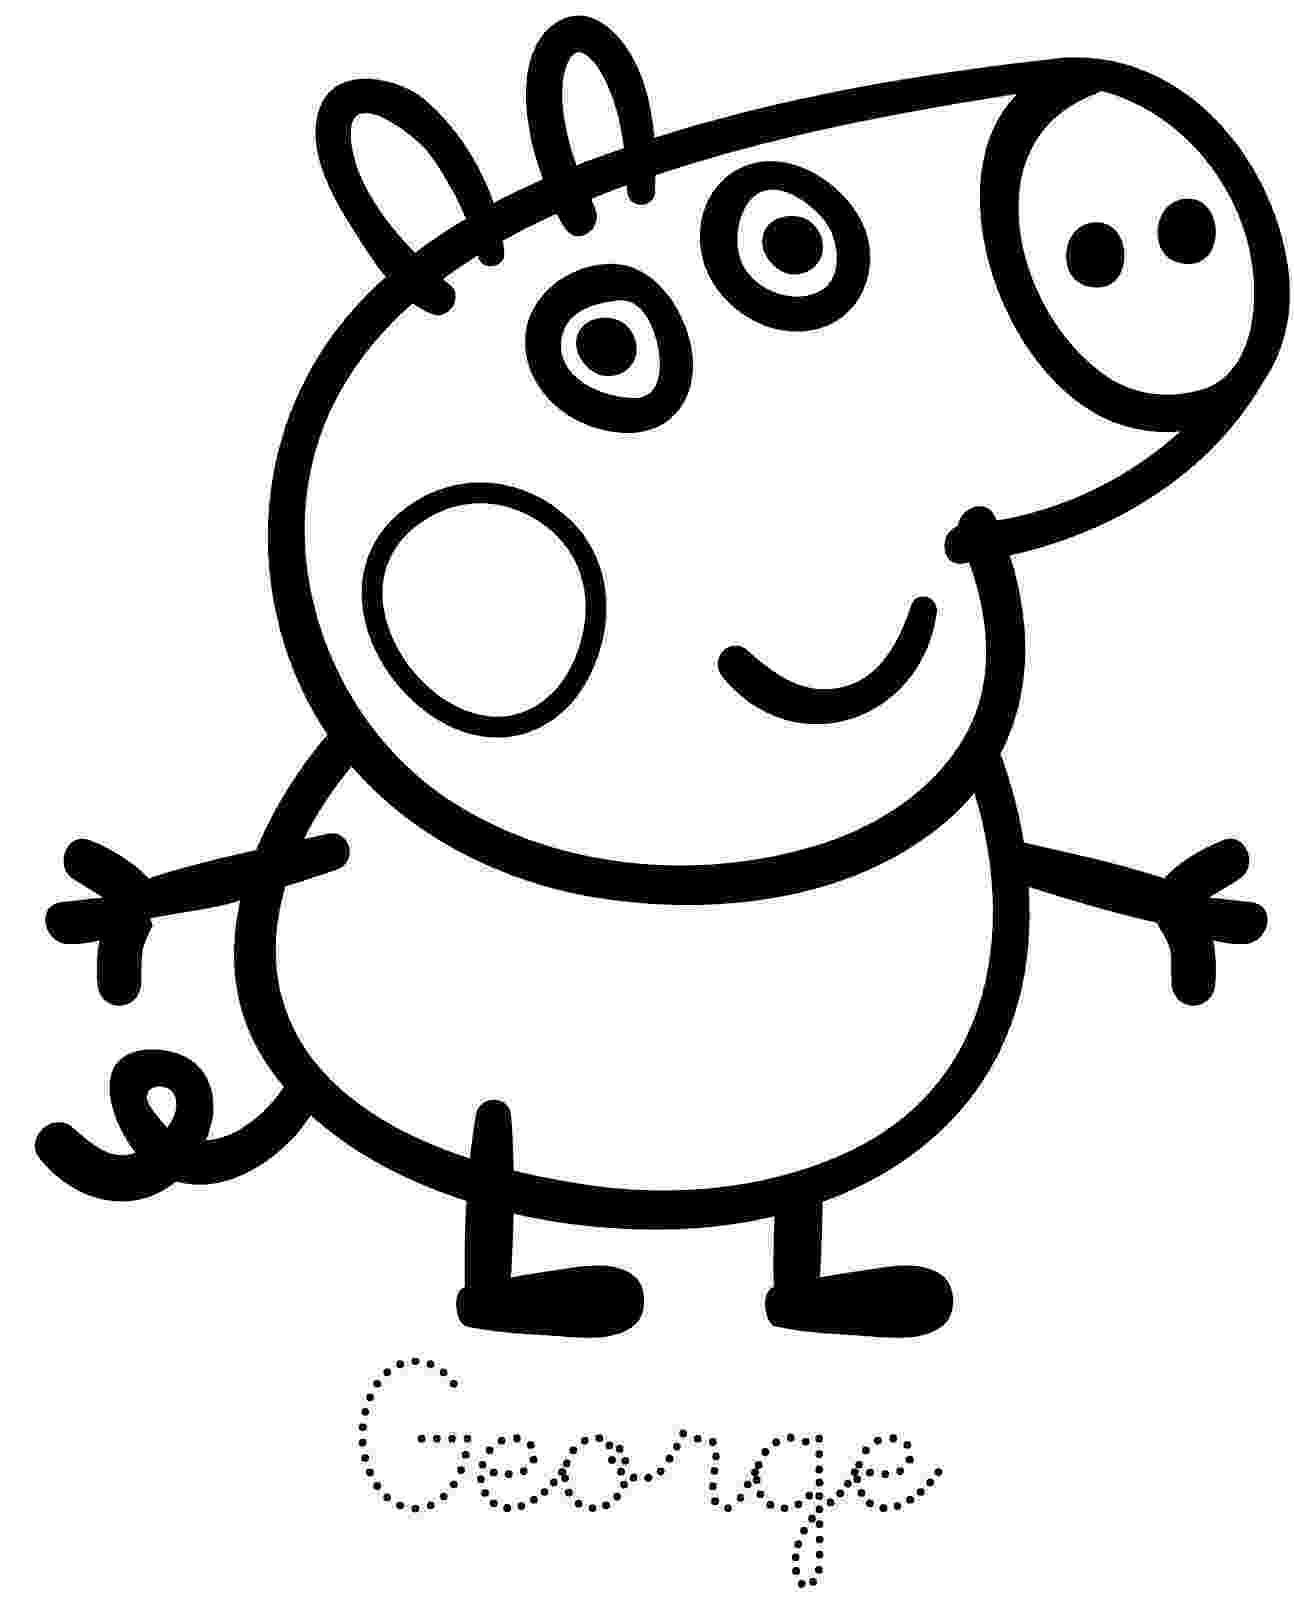 peppa pig coloring page peppa pig39s royal family coloring page free printable coloring page pig peppa